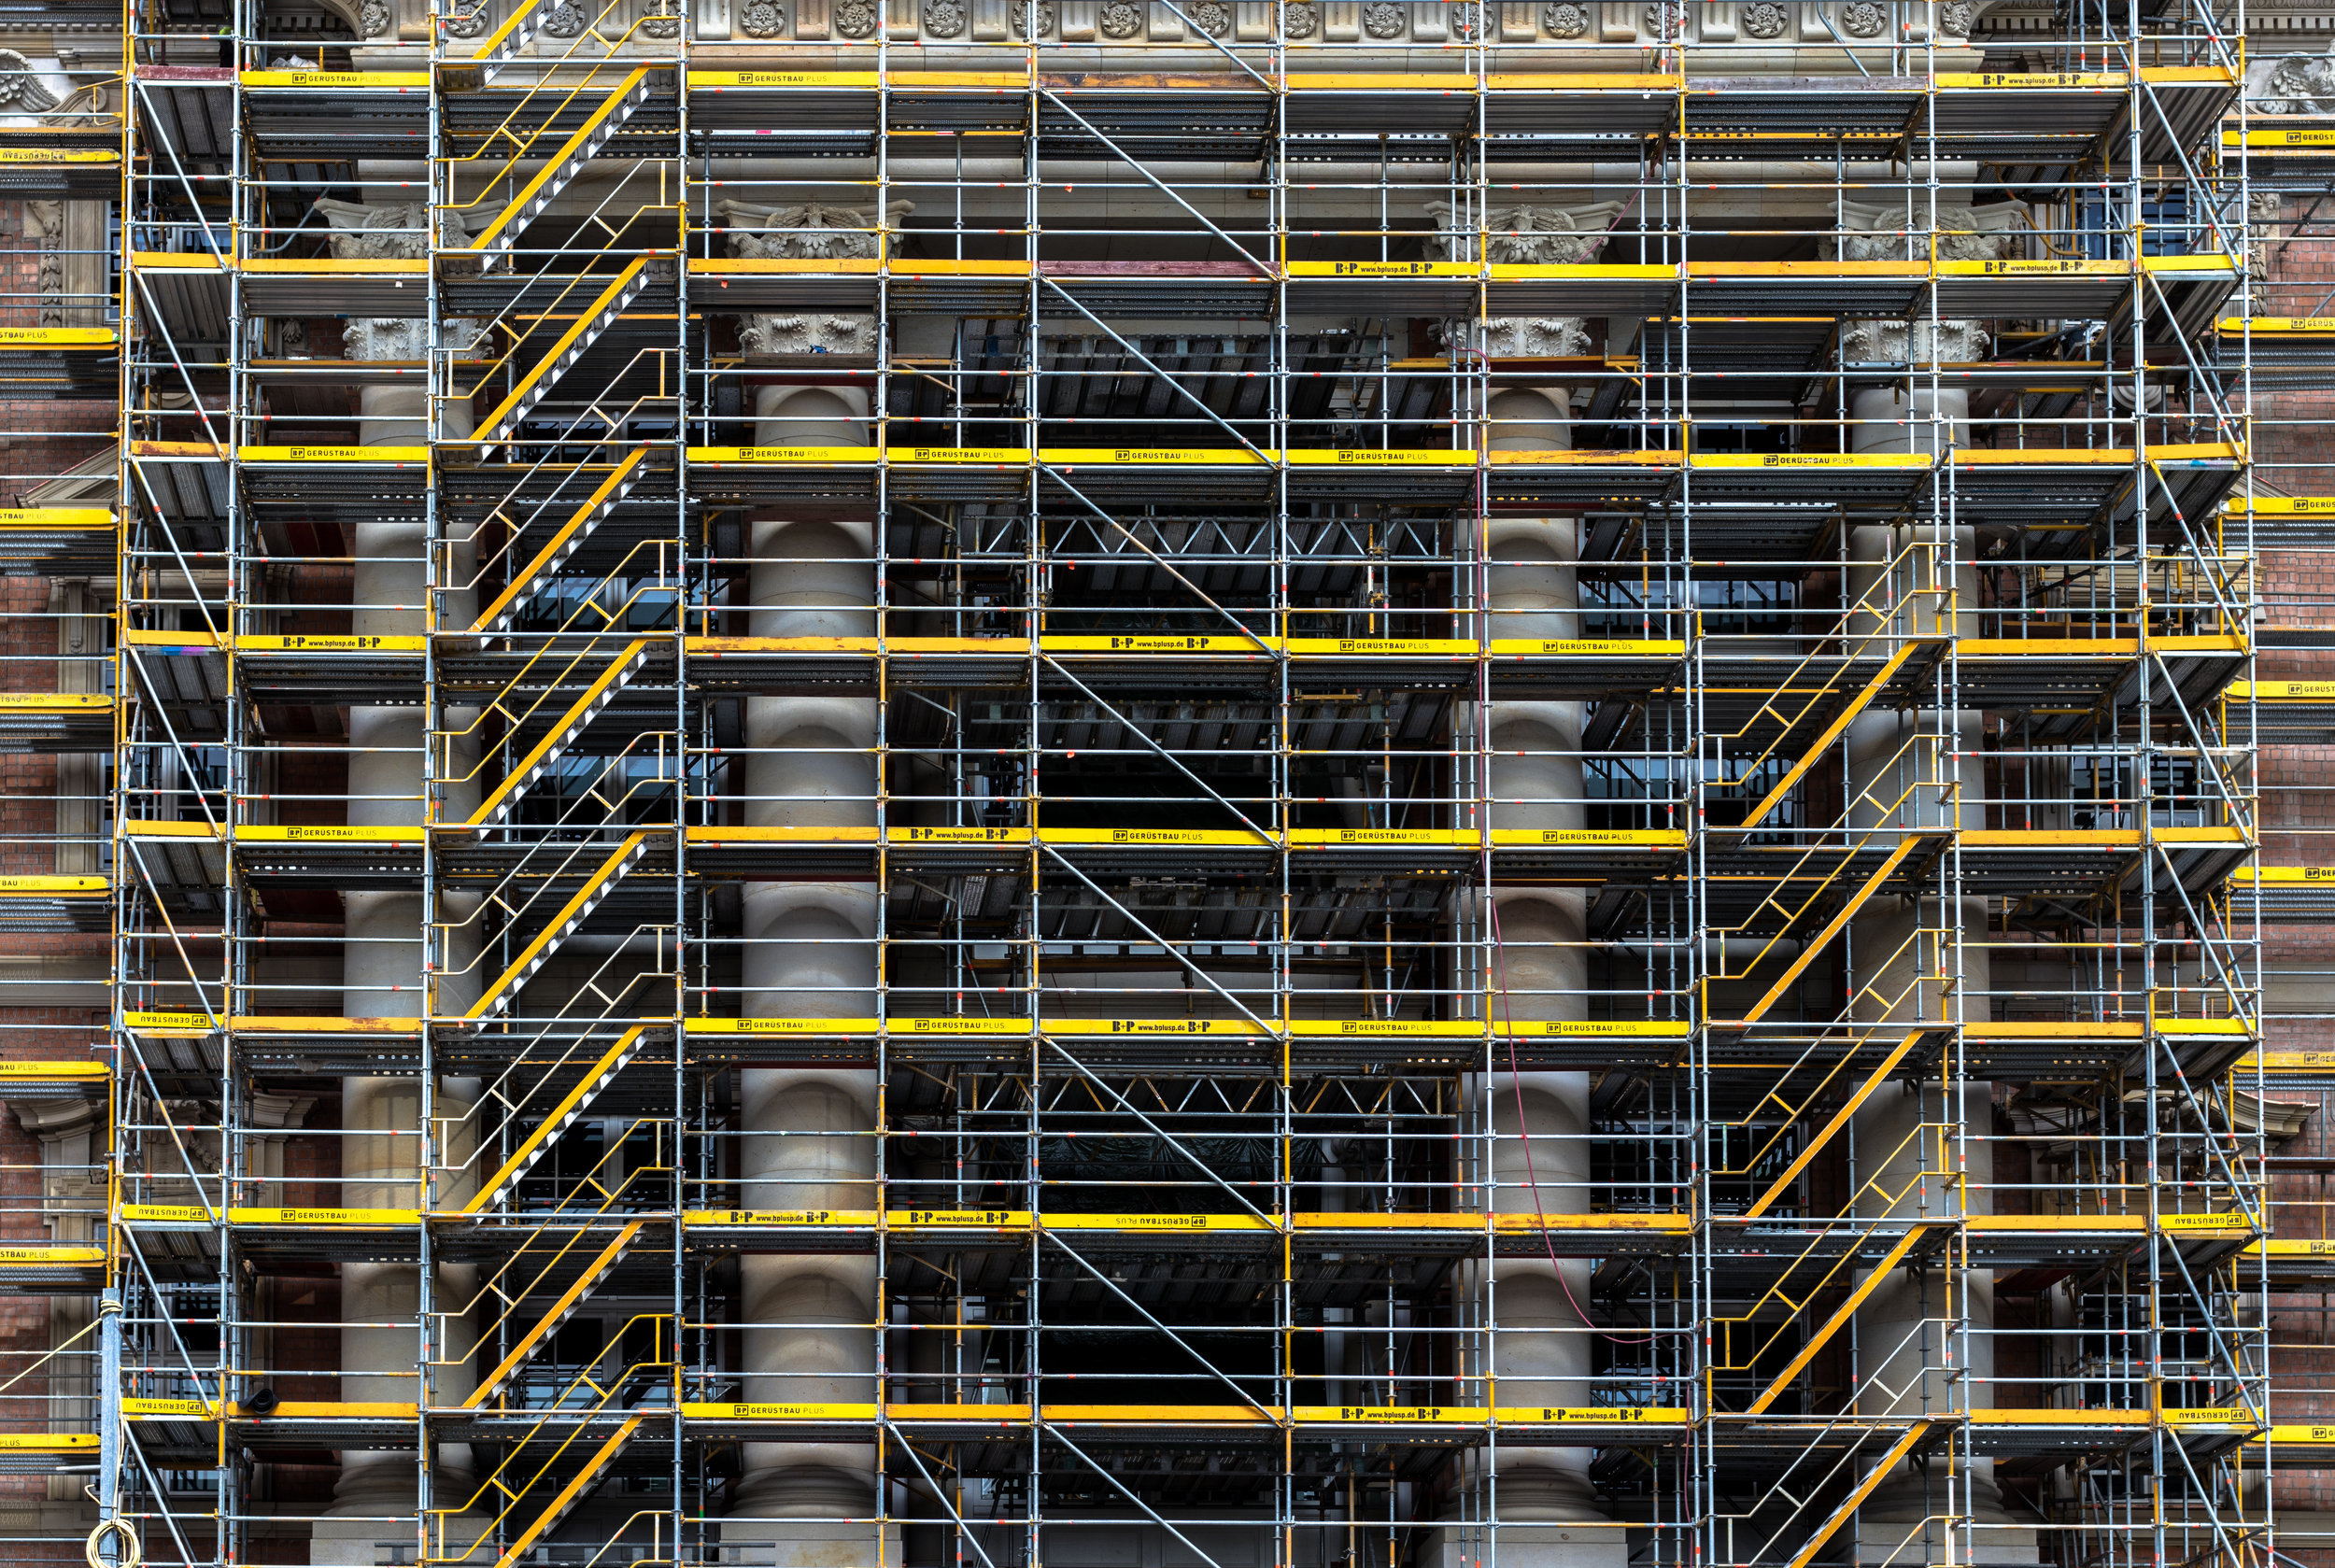 ARCHItECTURE & CONSTRUCTION -